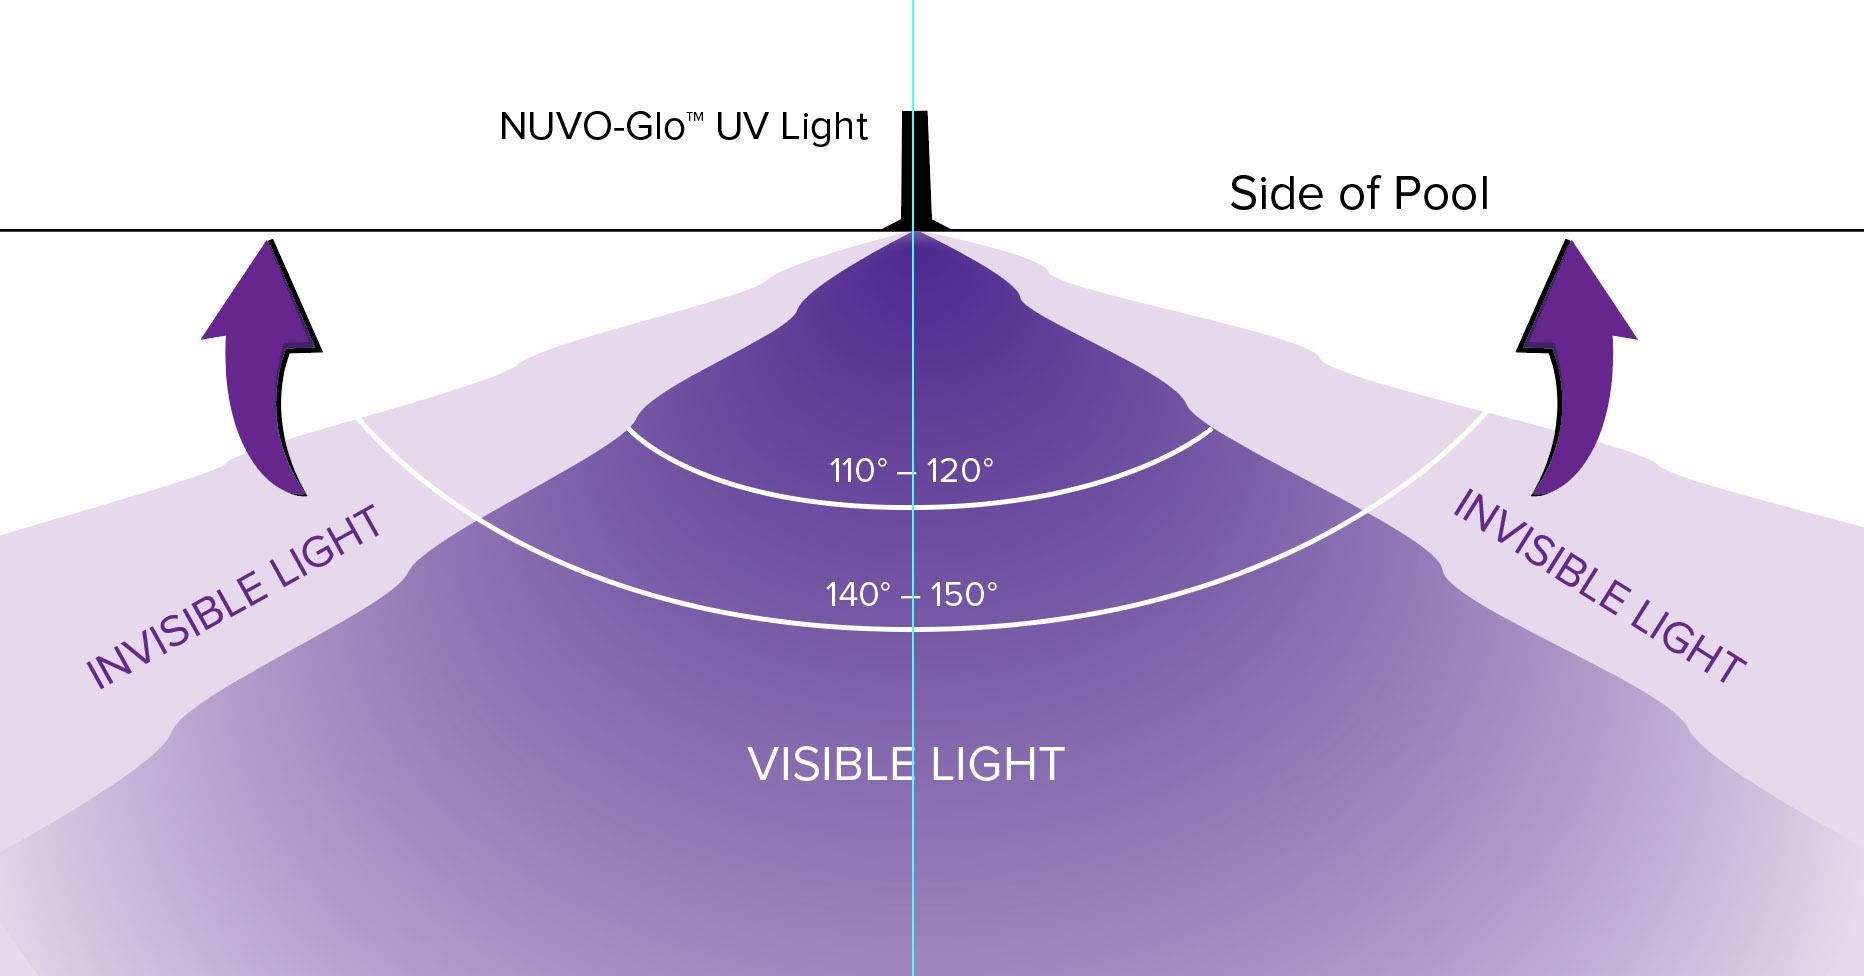 NUVO-Glo UV Light Spread